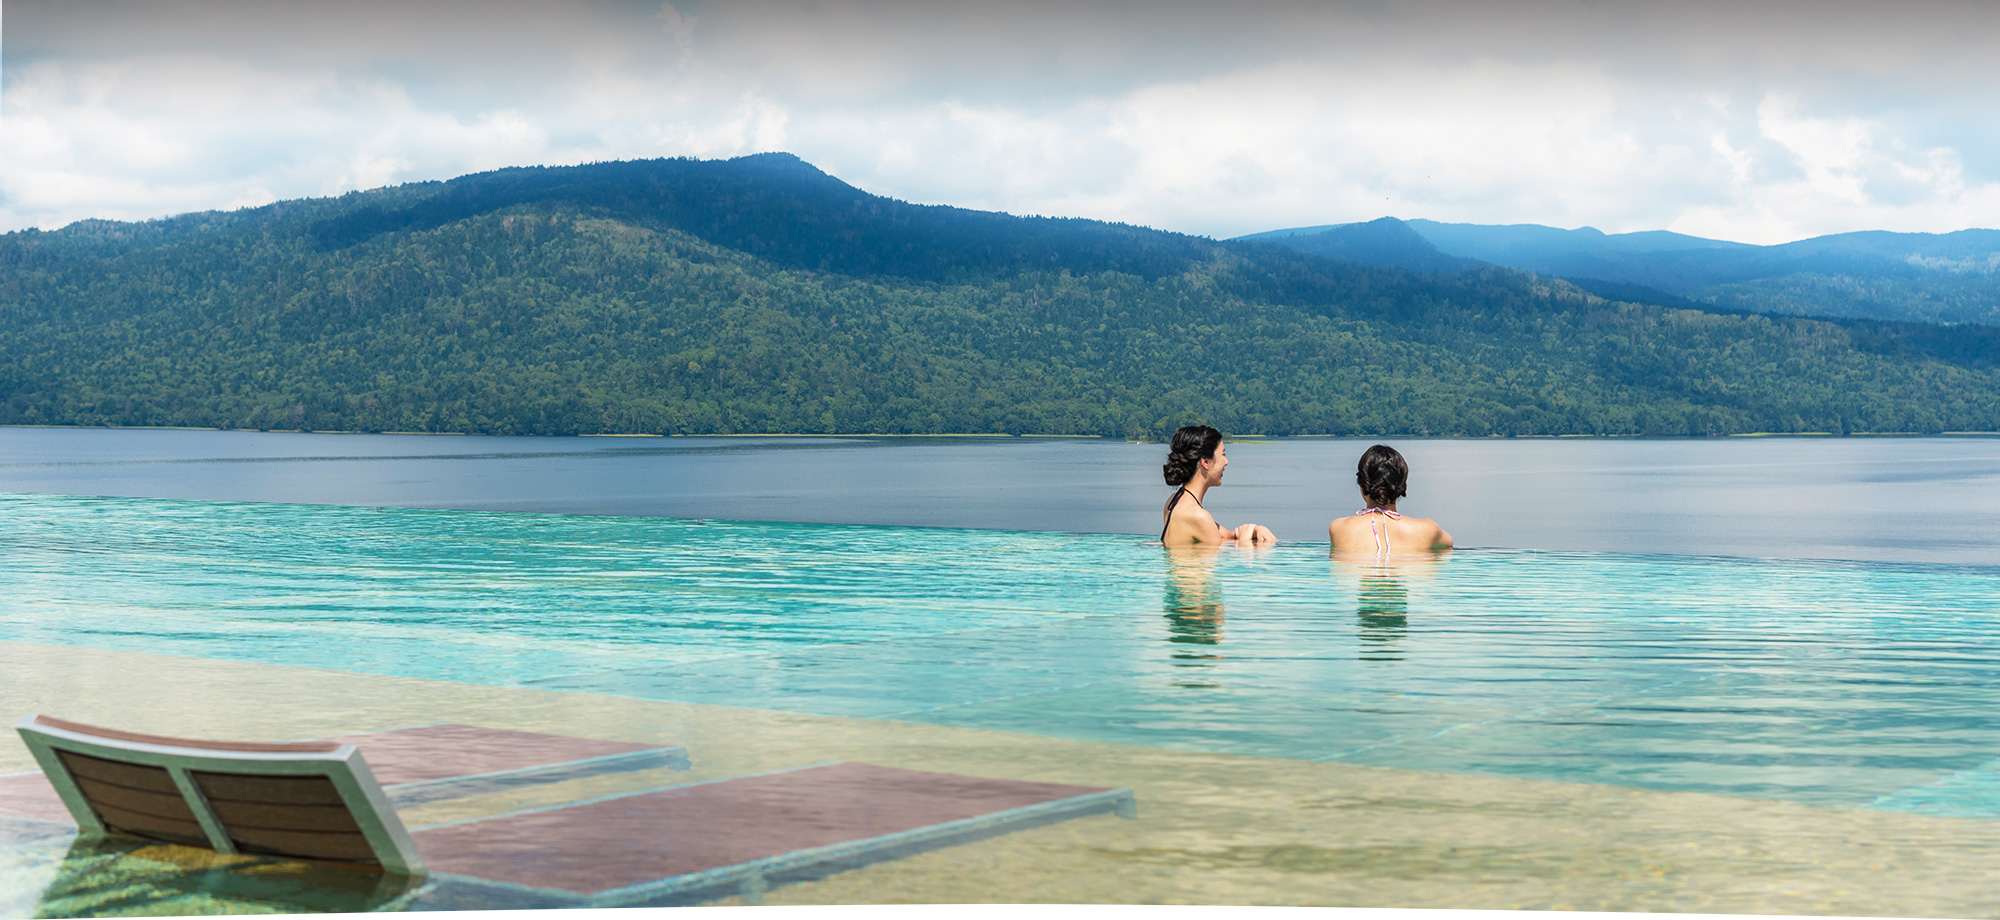 NEW AKAN HOTEL 阿寒の大自然とひとつになる 森と湖のリゾート